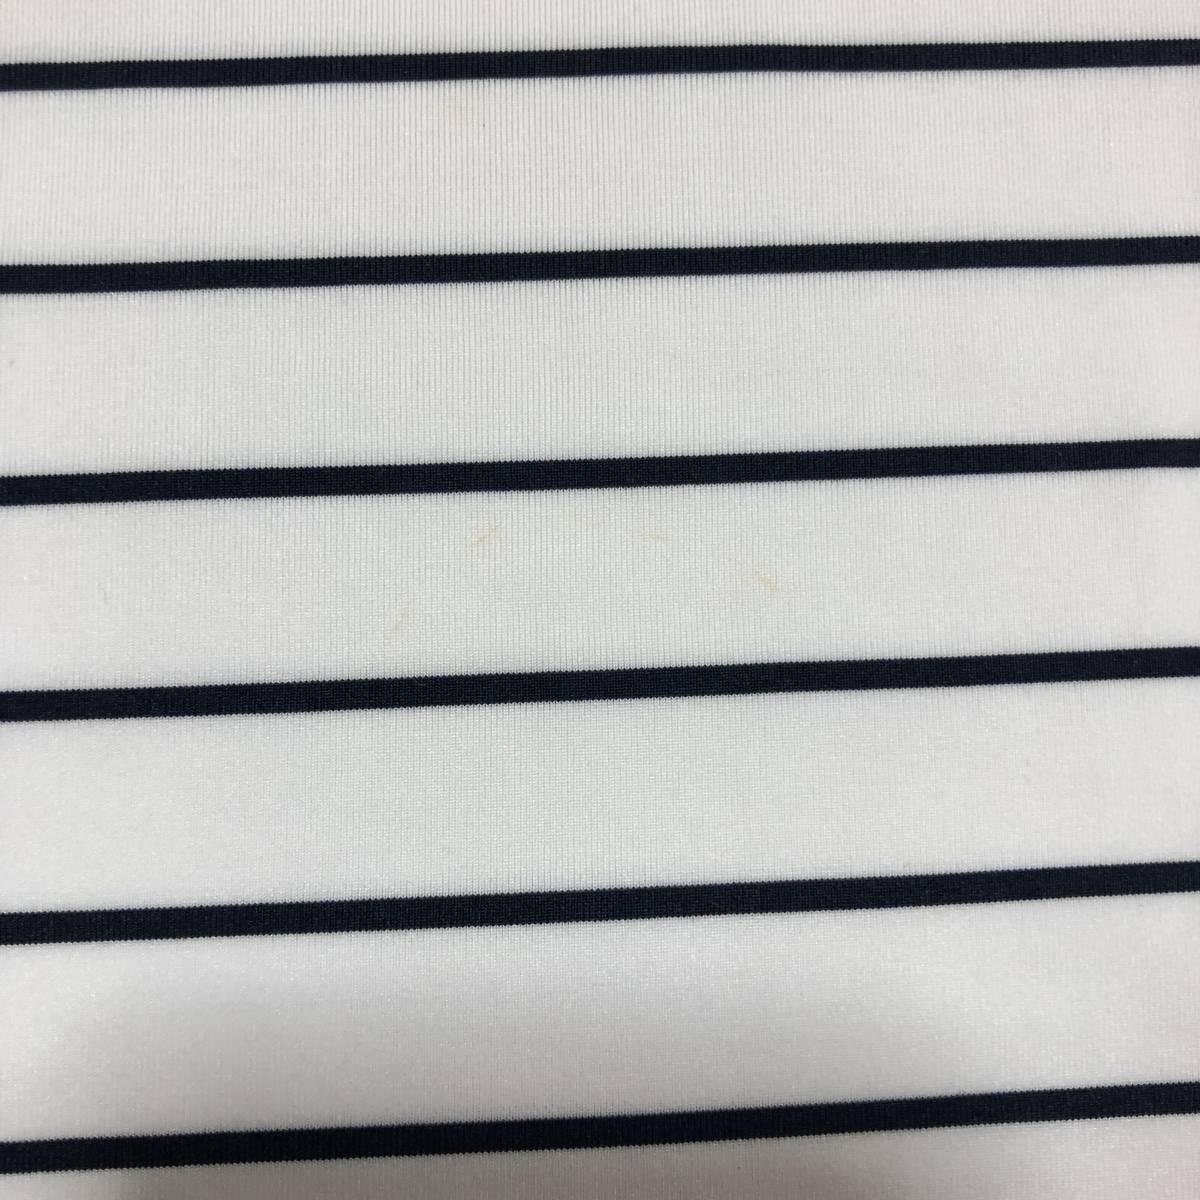 【FOOT JOY】 FJ フットジョイ ゴルフ ウェア 半袖 ポロシャツ メンズ 男性用_画像5